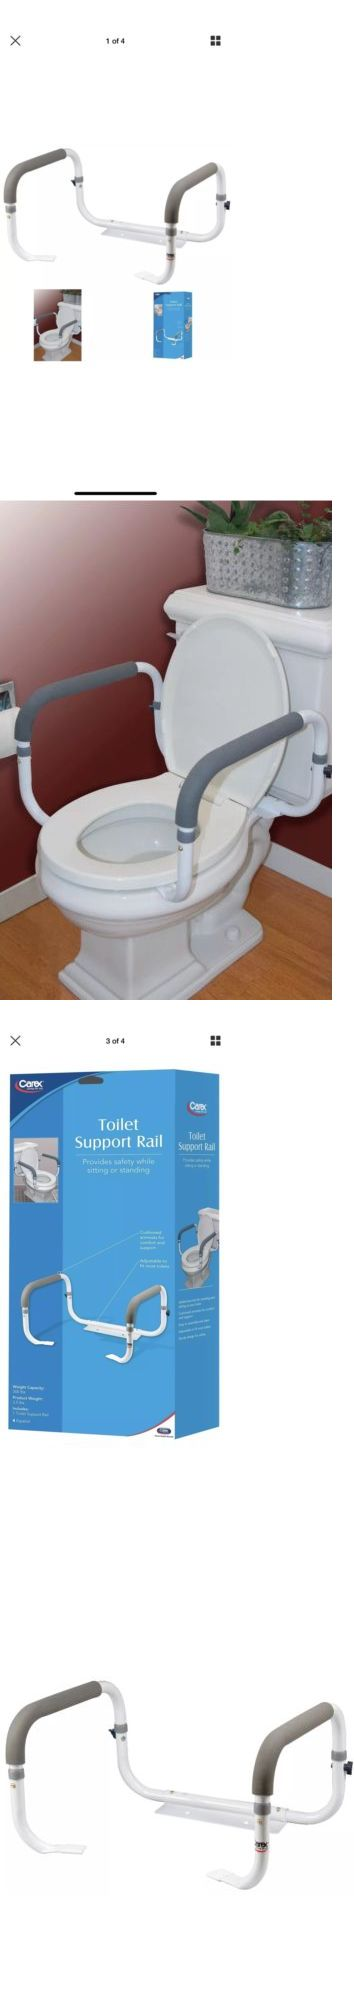 Handles and Rails 171537 Toilet Safety Frame Rail Bathroom Grab